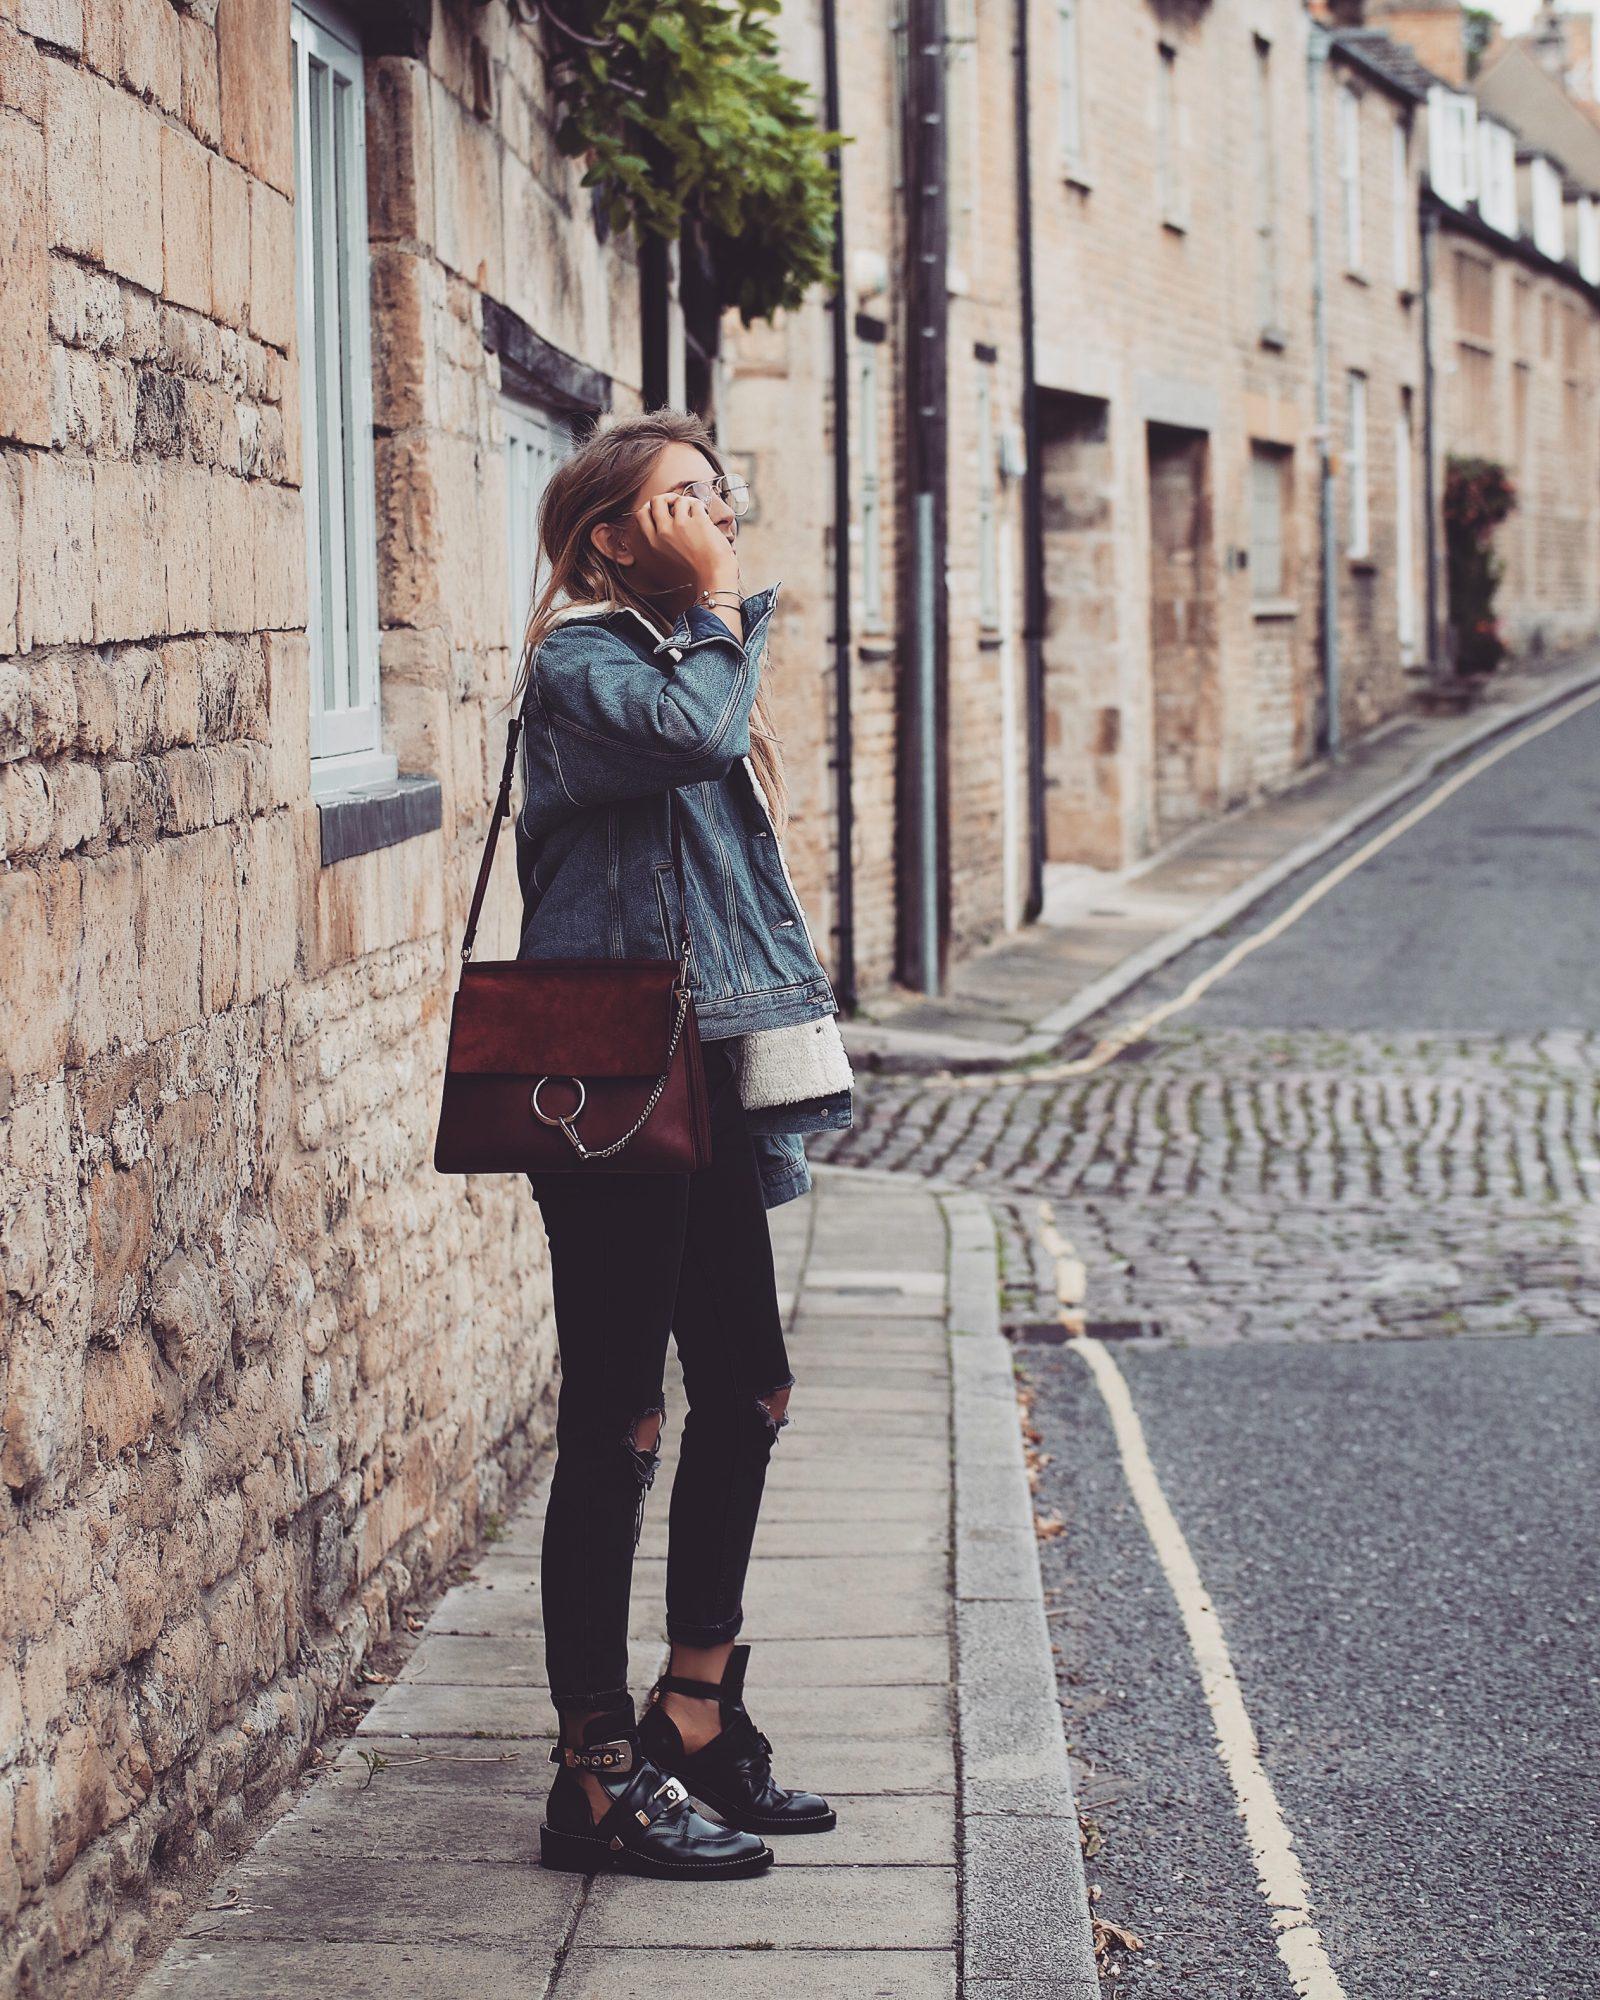 Denim Shearling Jacket - Style Inspiration